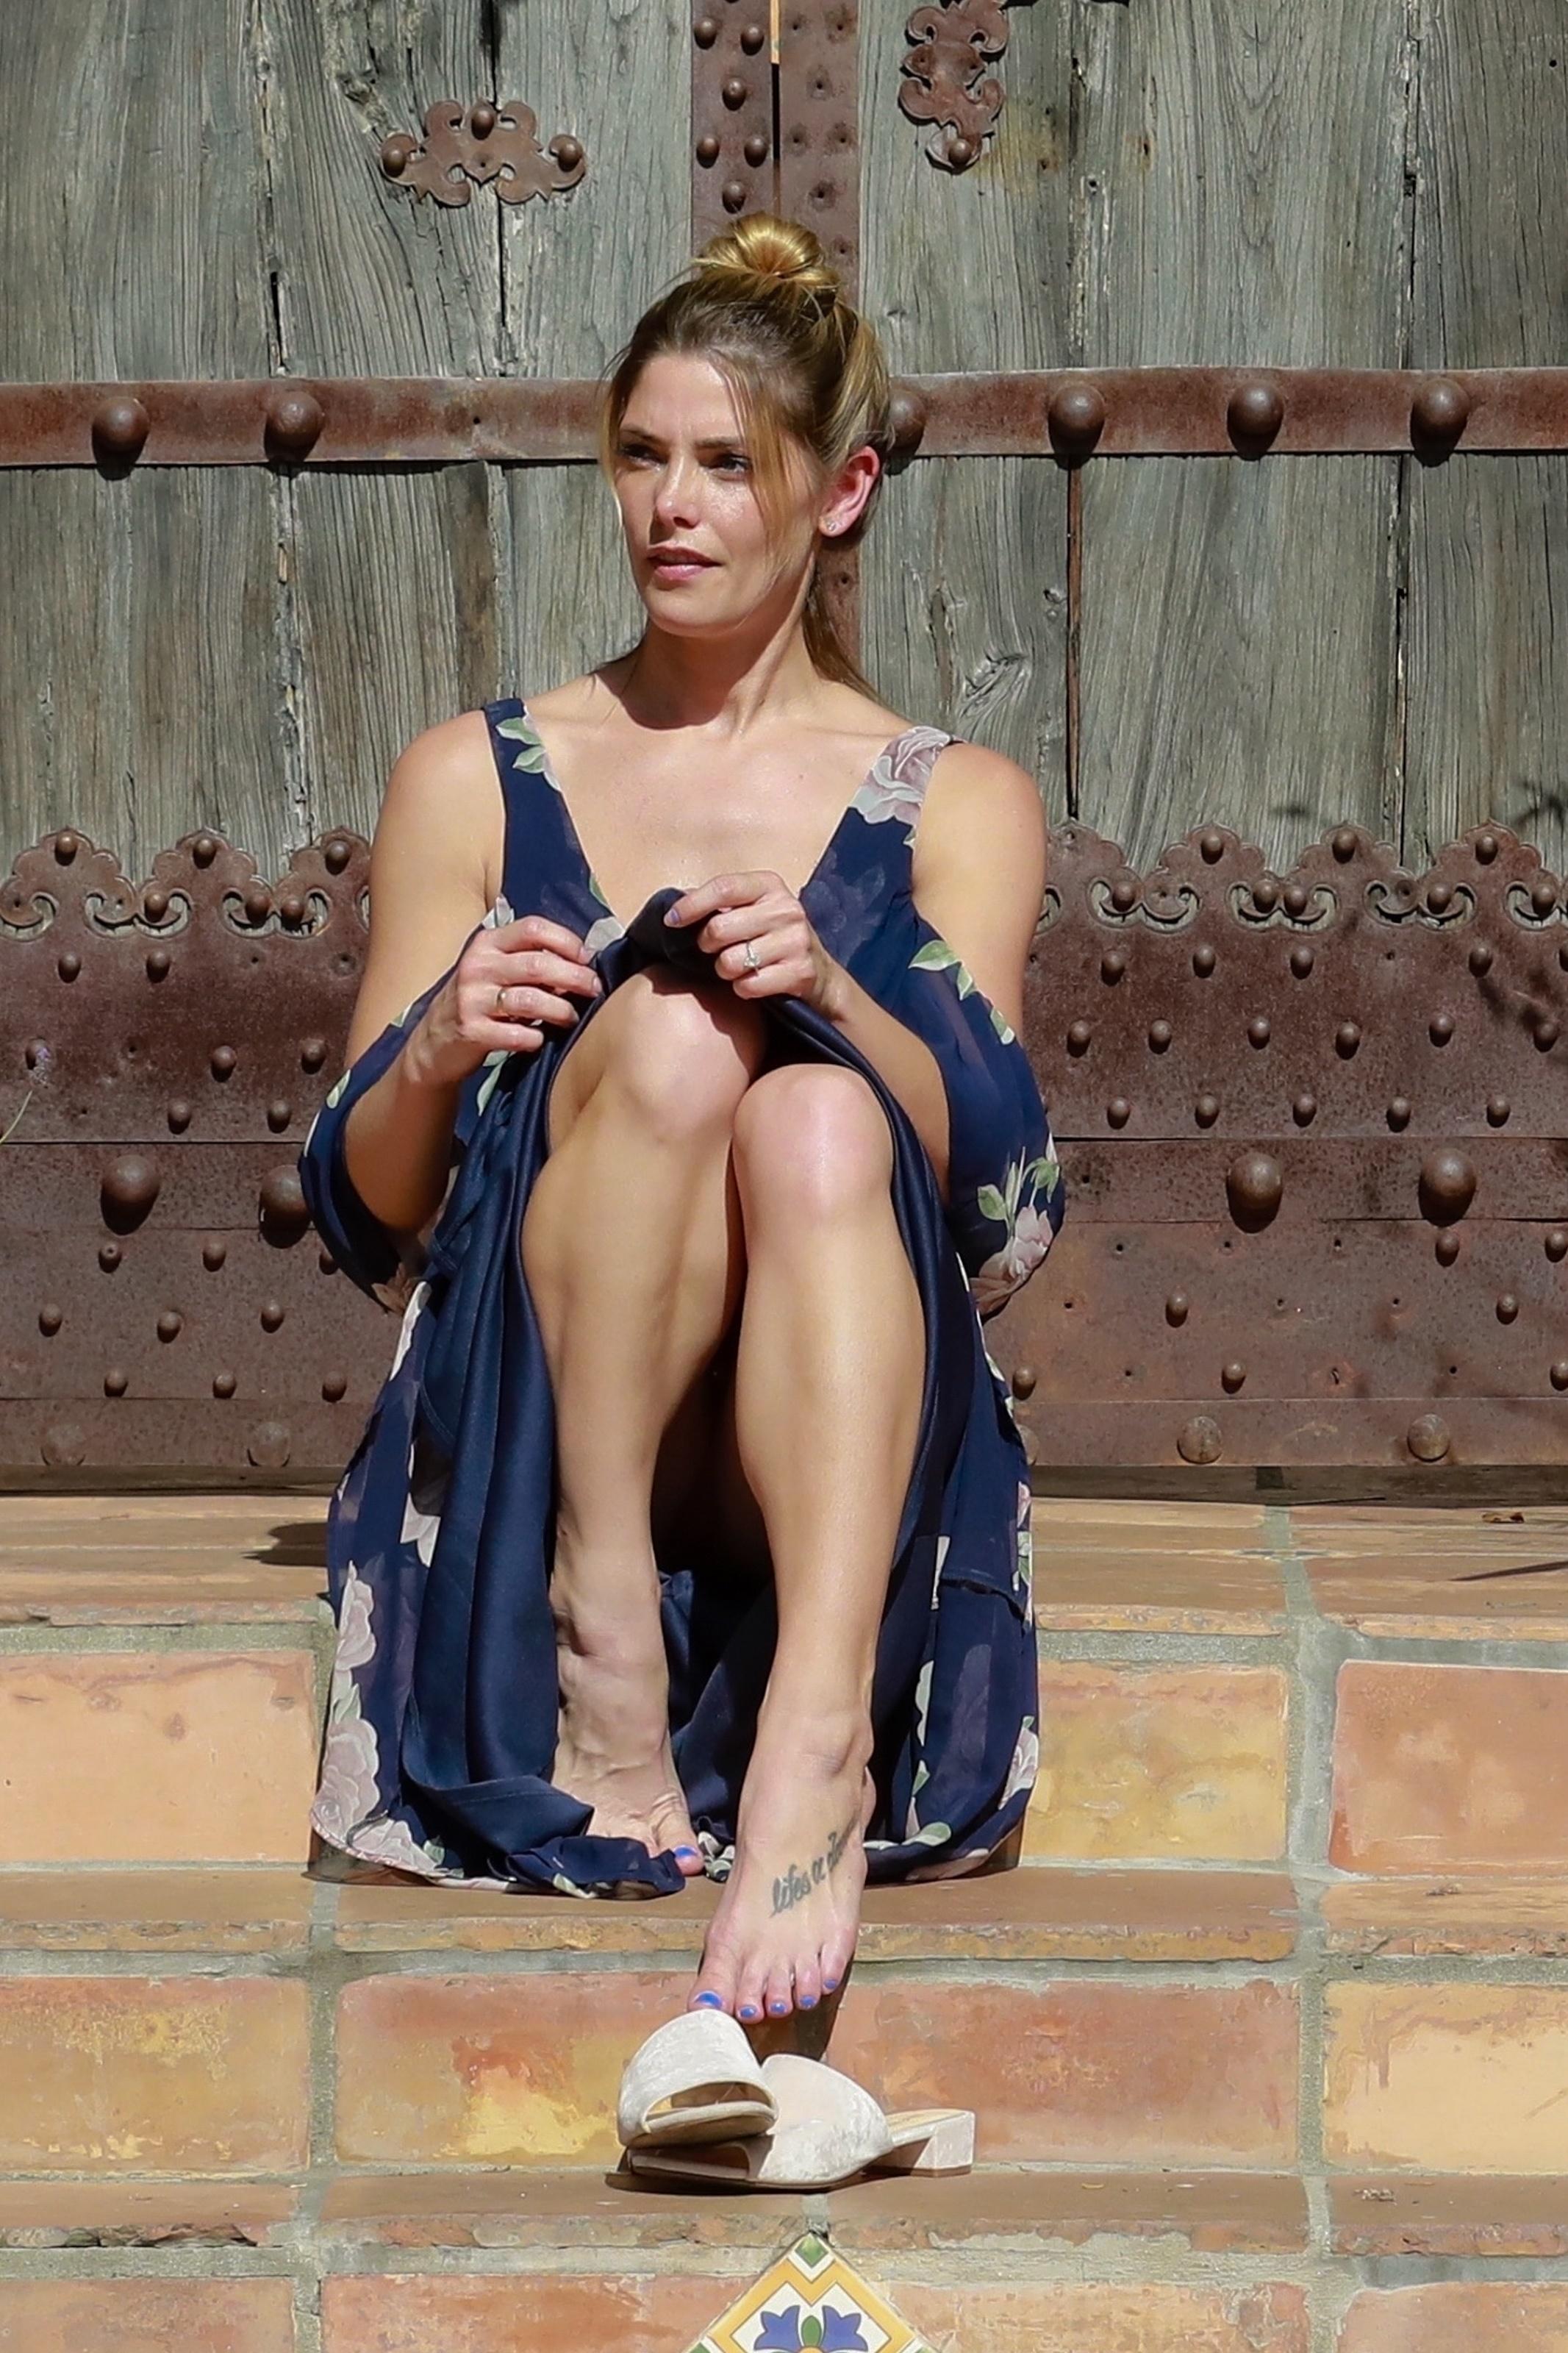 Sexy Feet Ashley Greene naked photo 2017